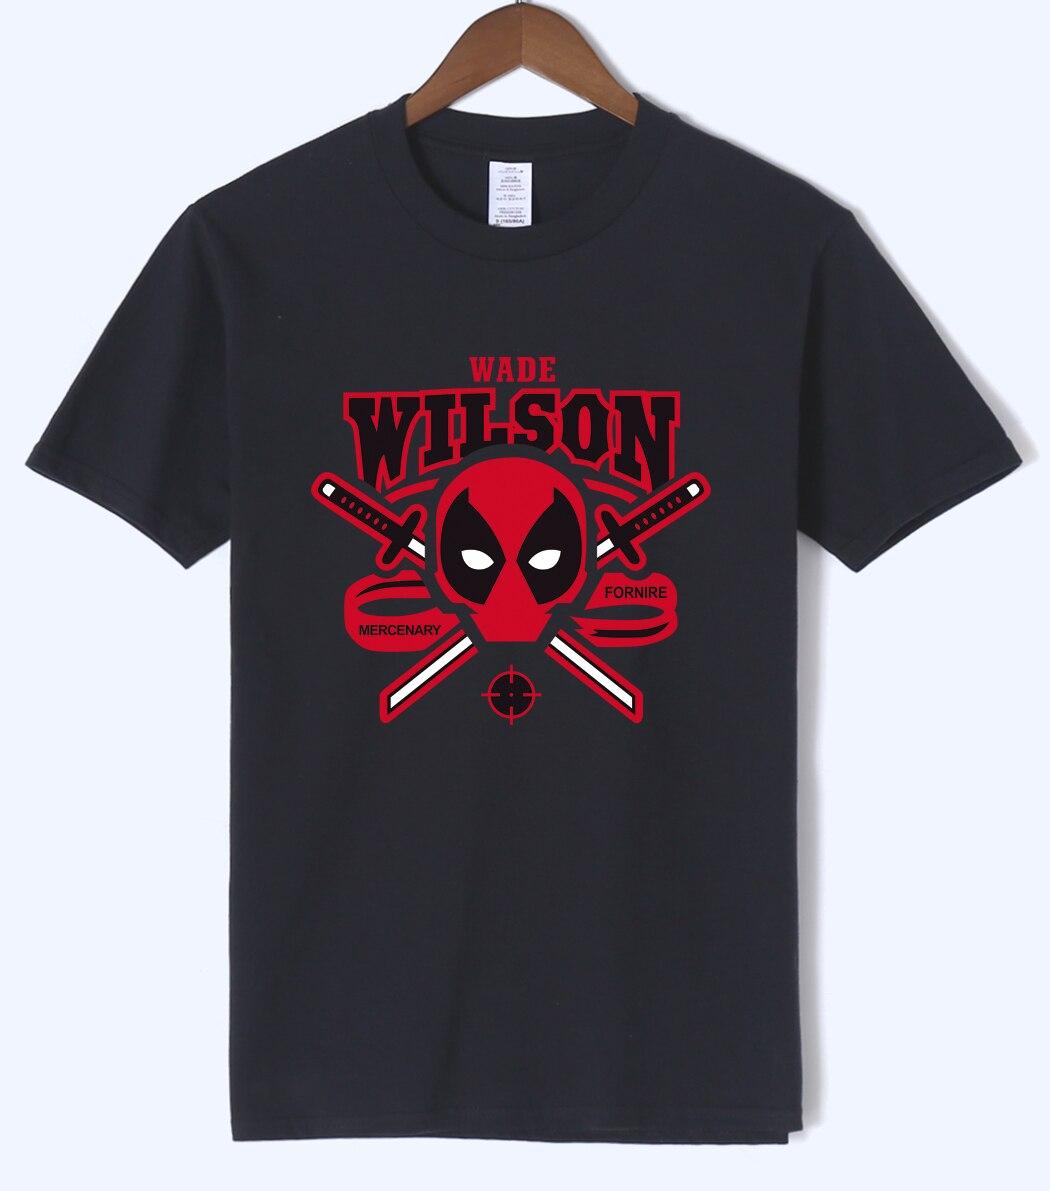 New Arrival Deadpool Wade Wilson T Shirts 2019 Summer Men Short Sleeve Shirts 100% Cotton Male T-Shirts Hip Hop Brand-Clothing